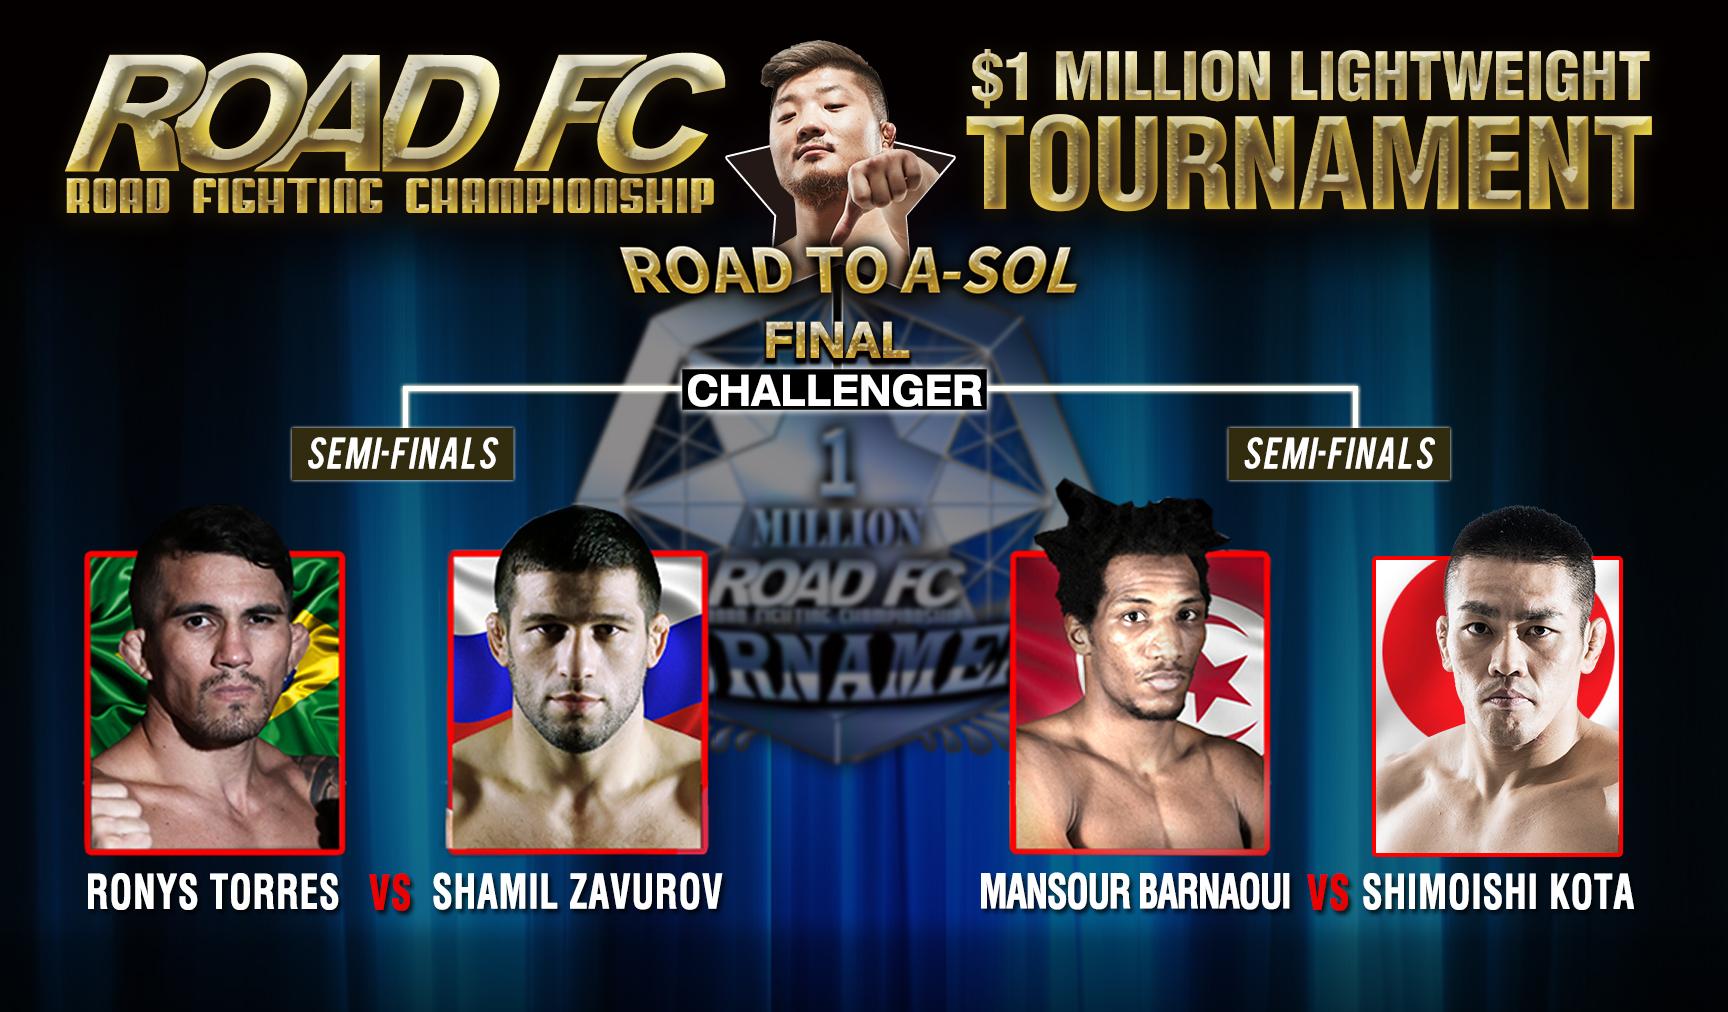 ROAD FC $1 Million Lightweight Tournament Semifinal Matches -